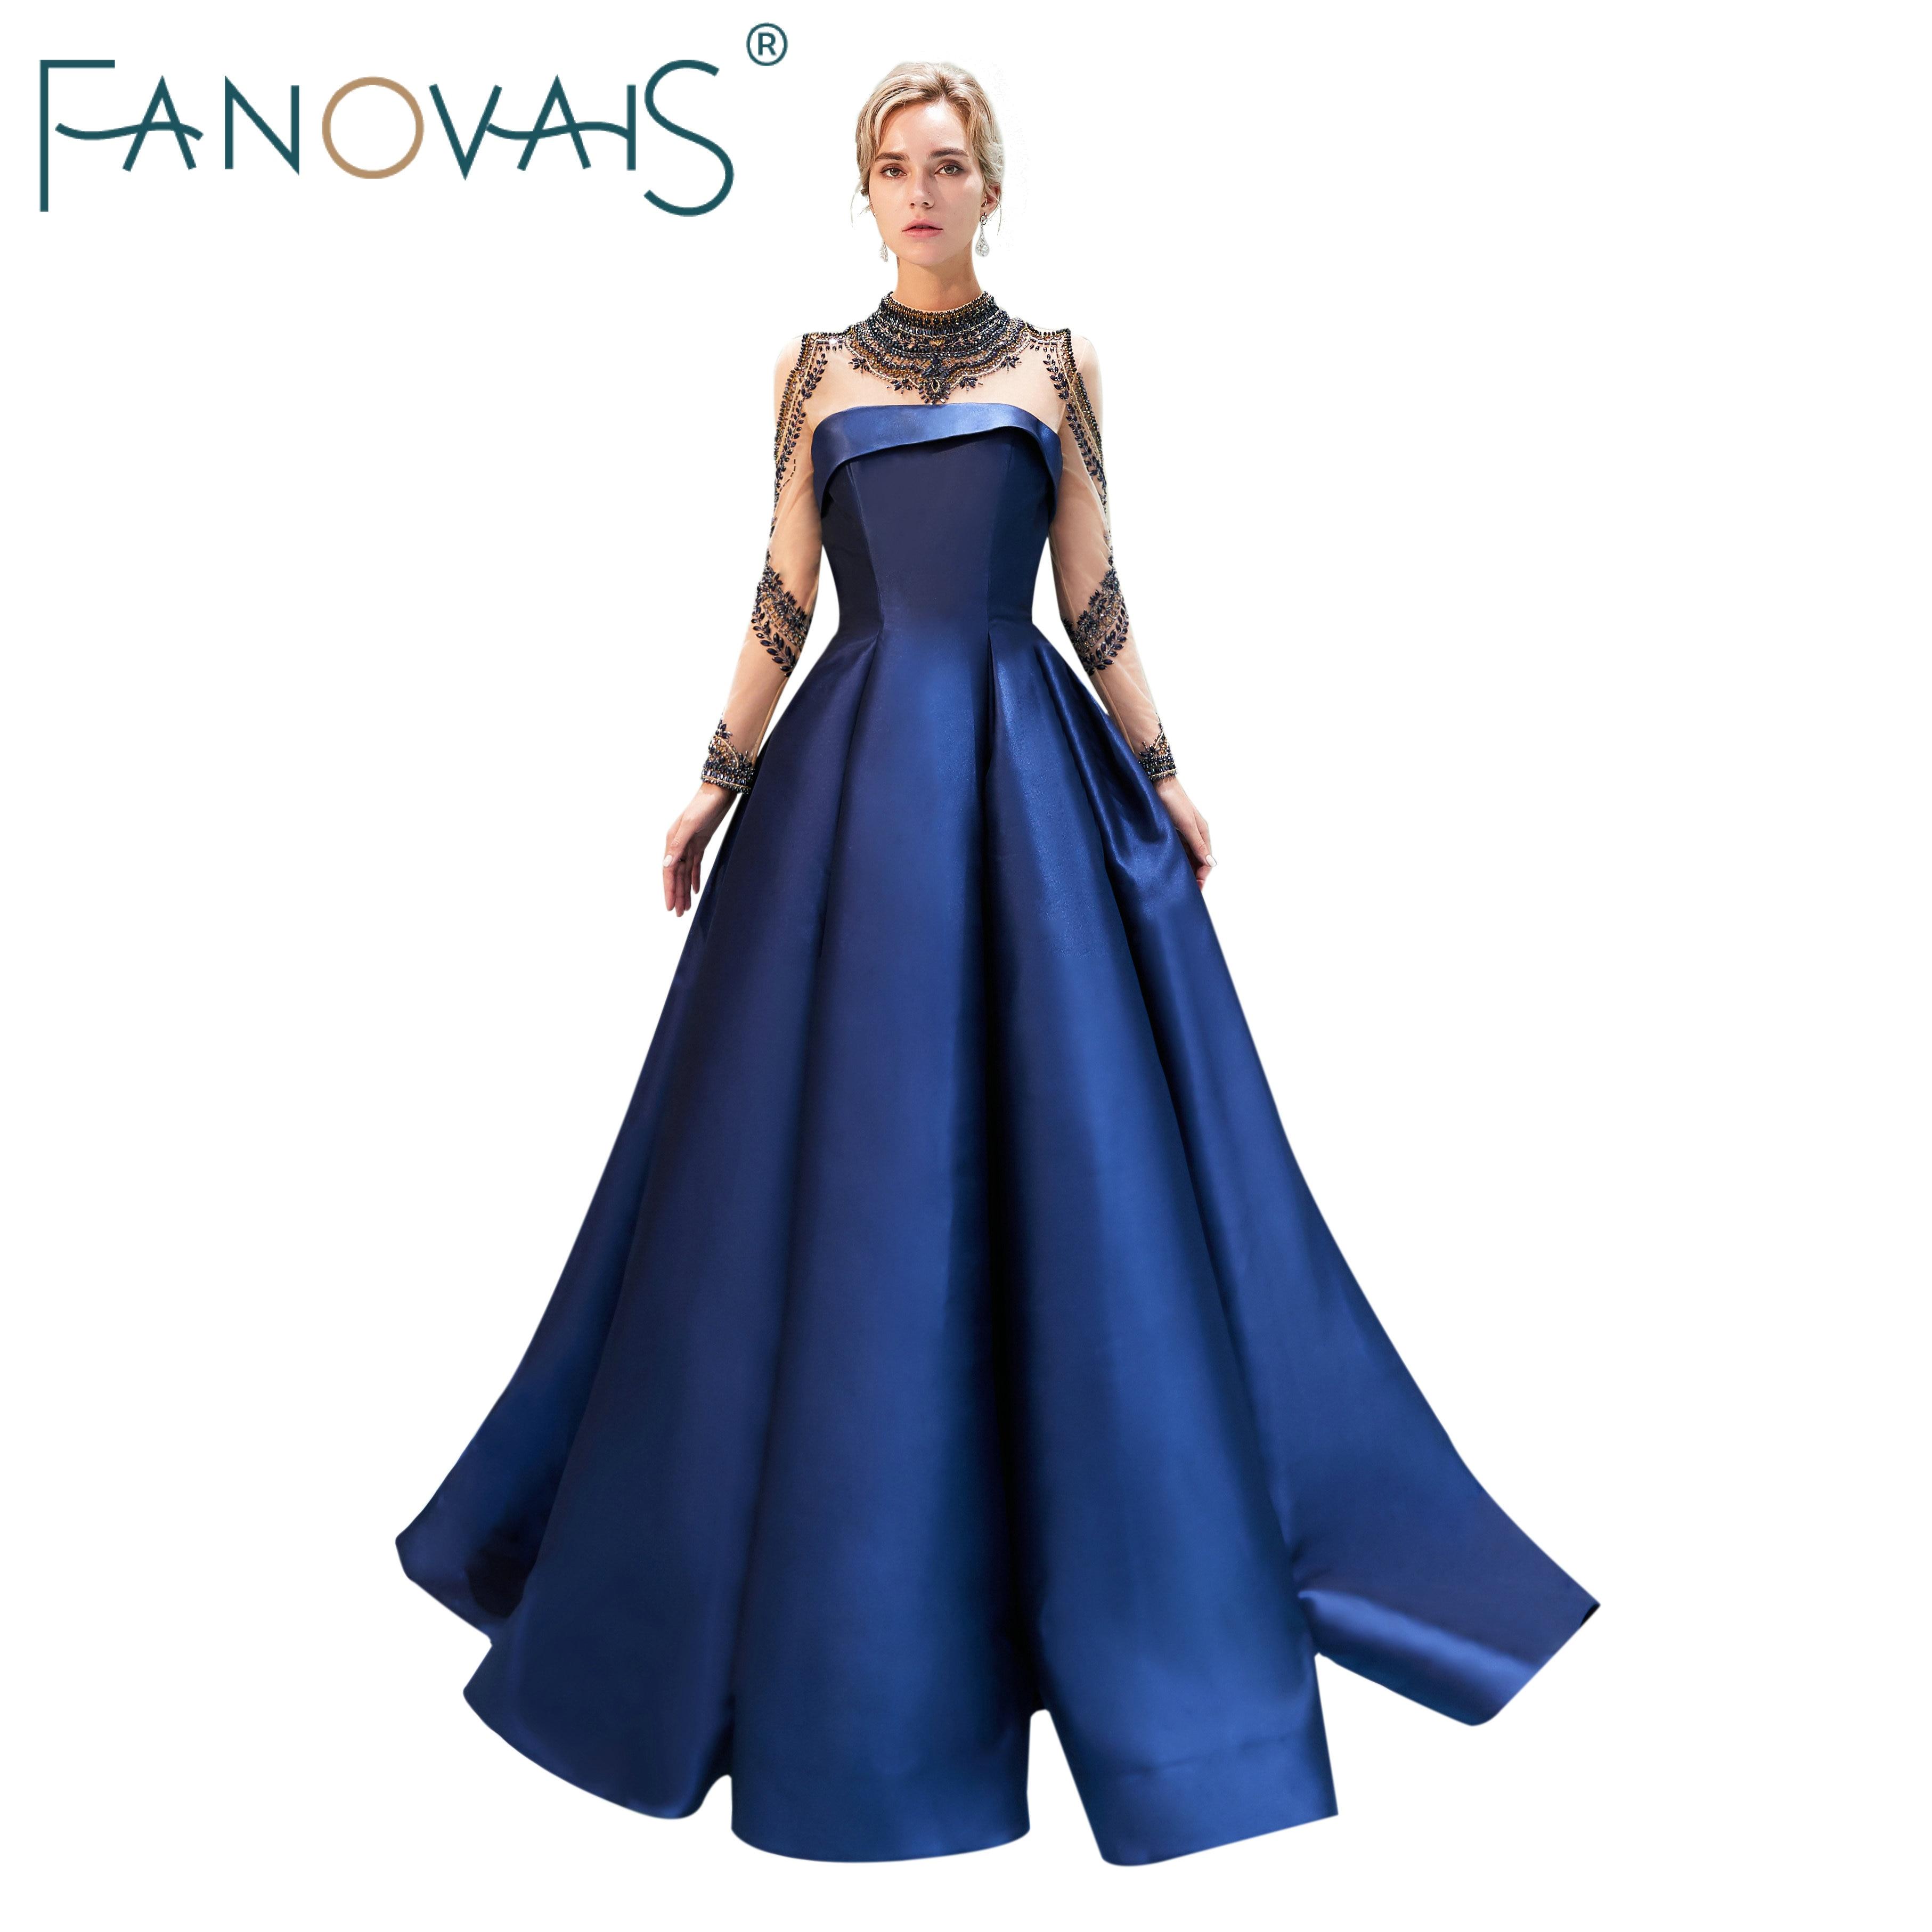 Royal Blue Evening Dresses Long Sleeves High neck Prom Dresses 2019 Vestido de festia longo robe de soiree satin evening gowns